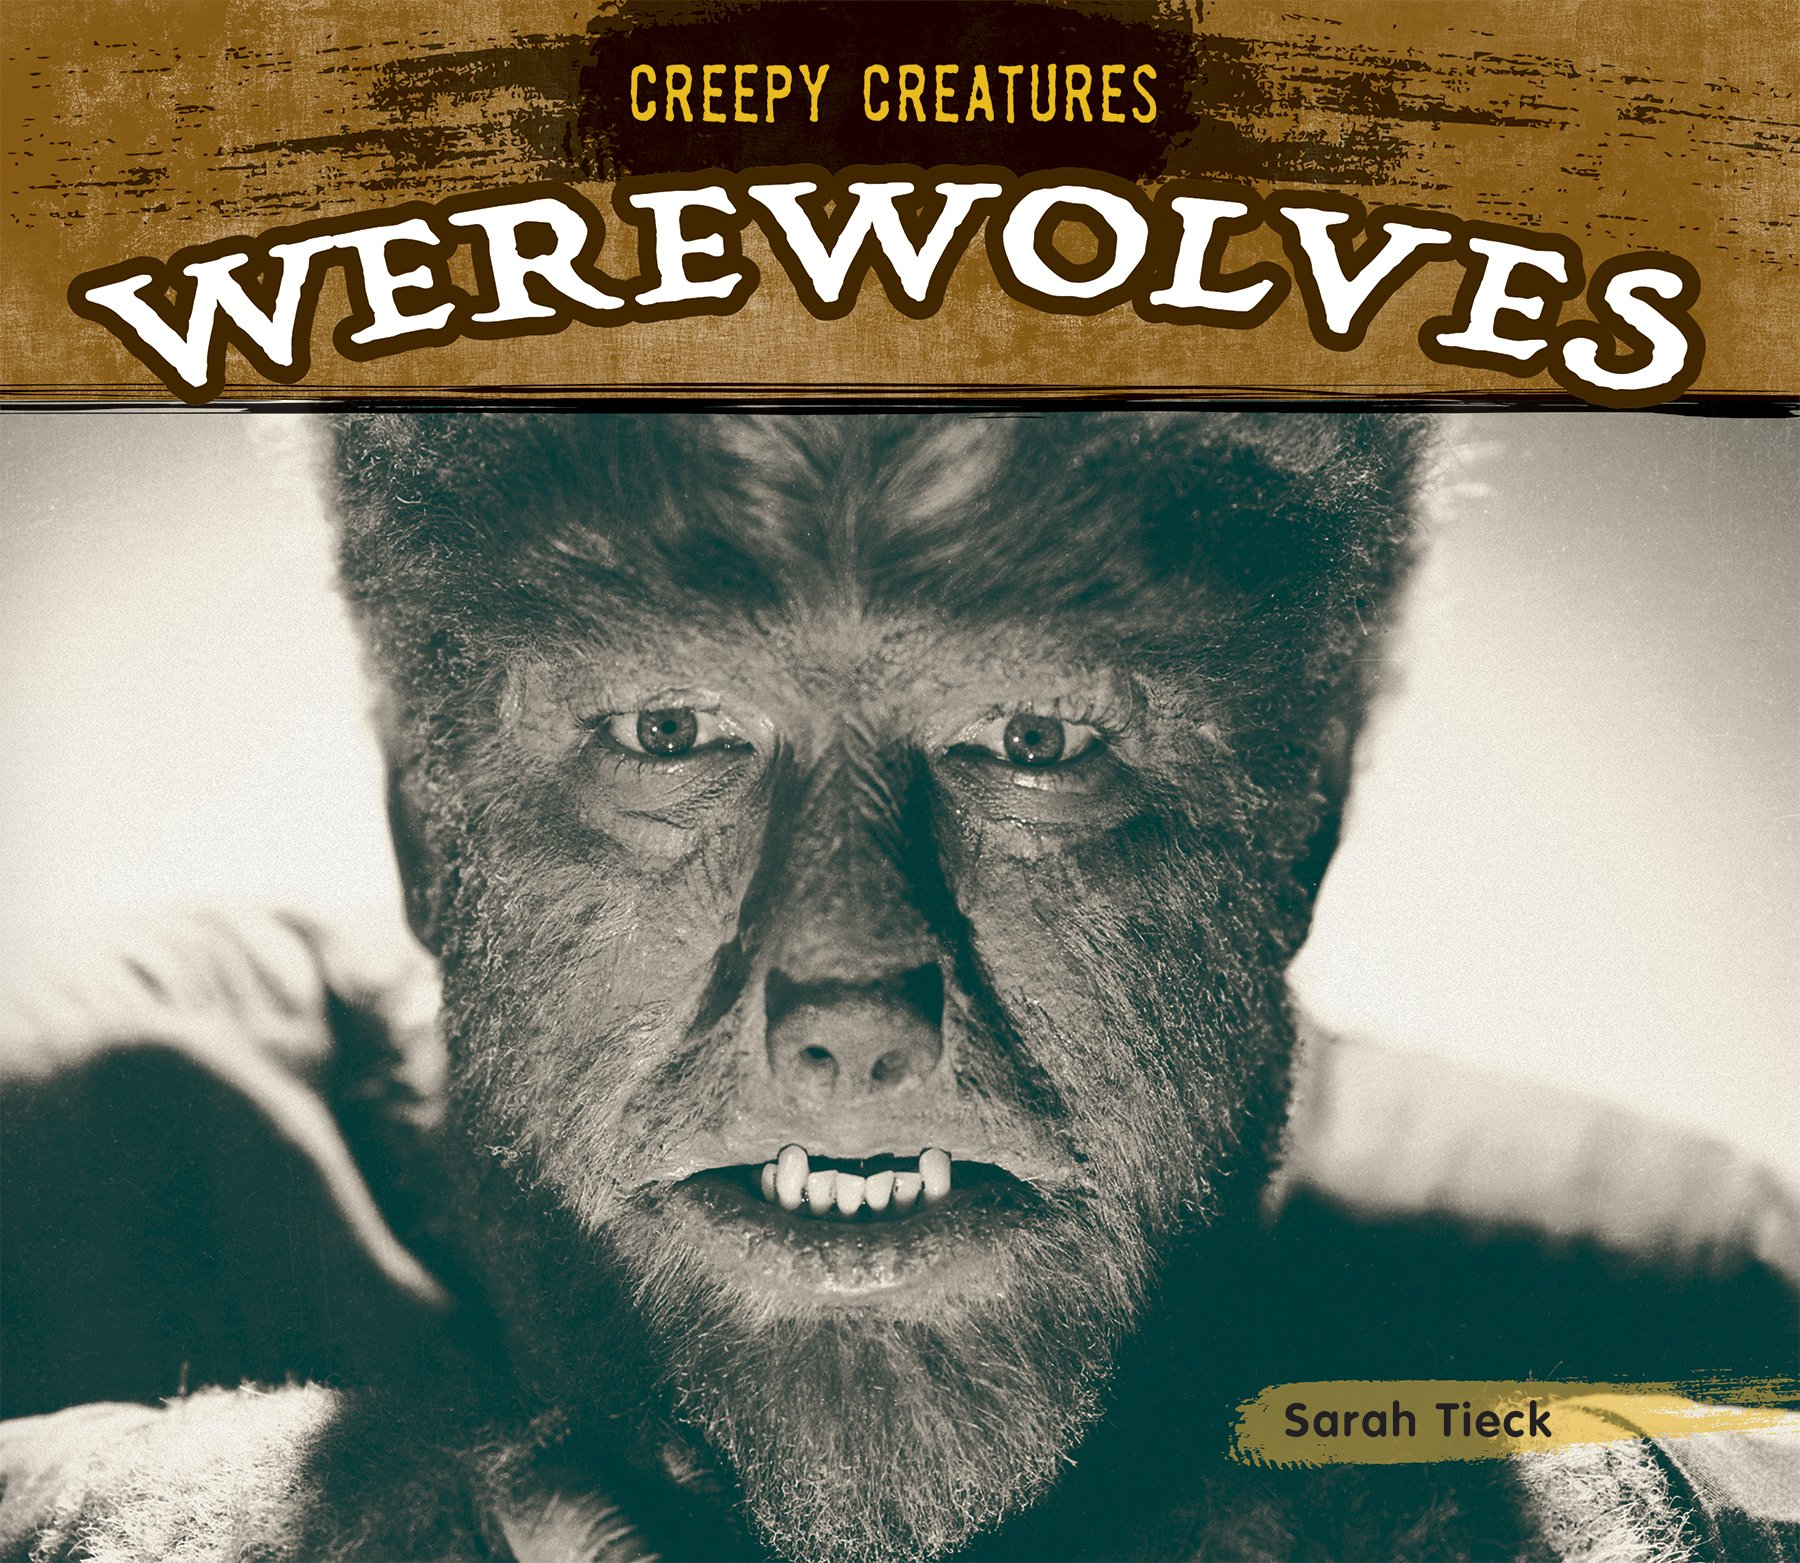 creepy creatures: werewolves